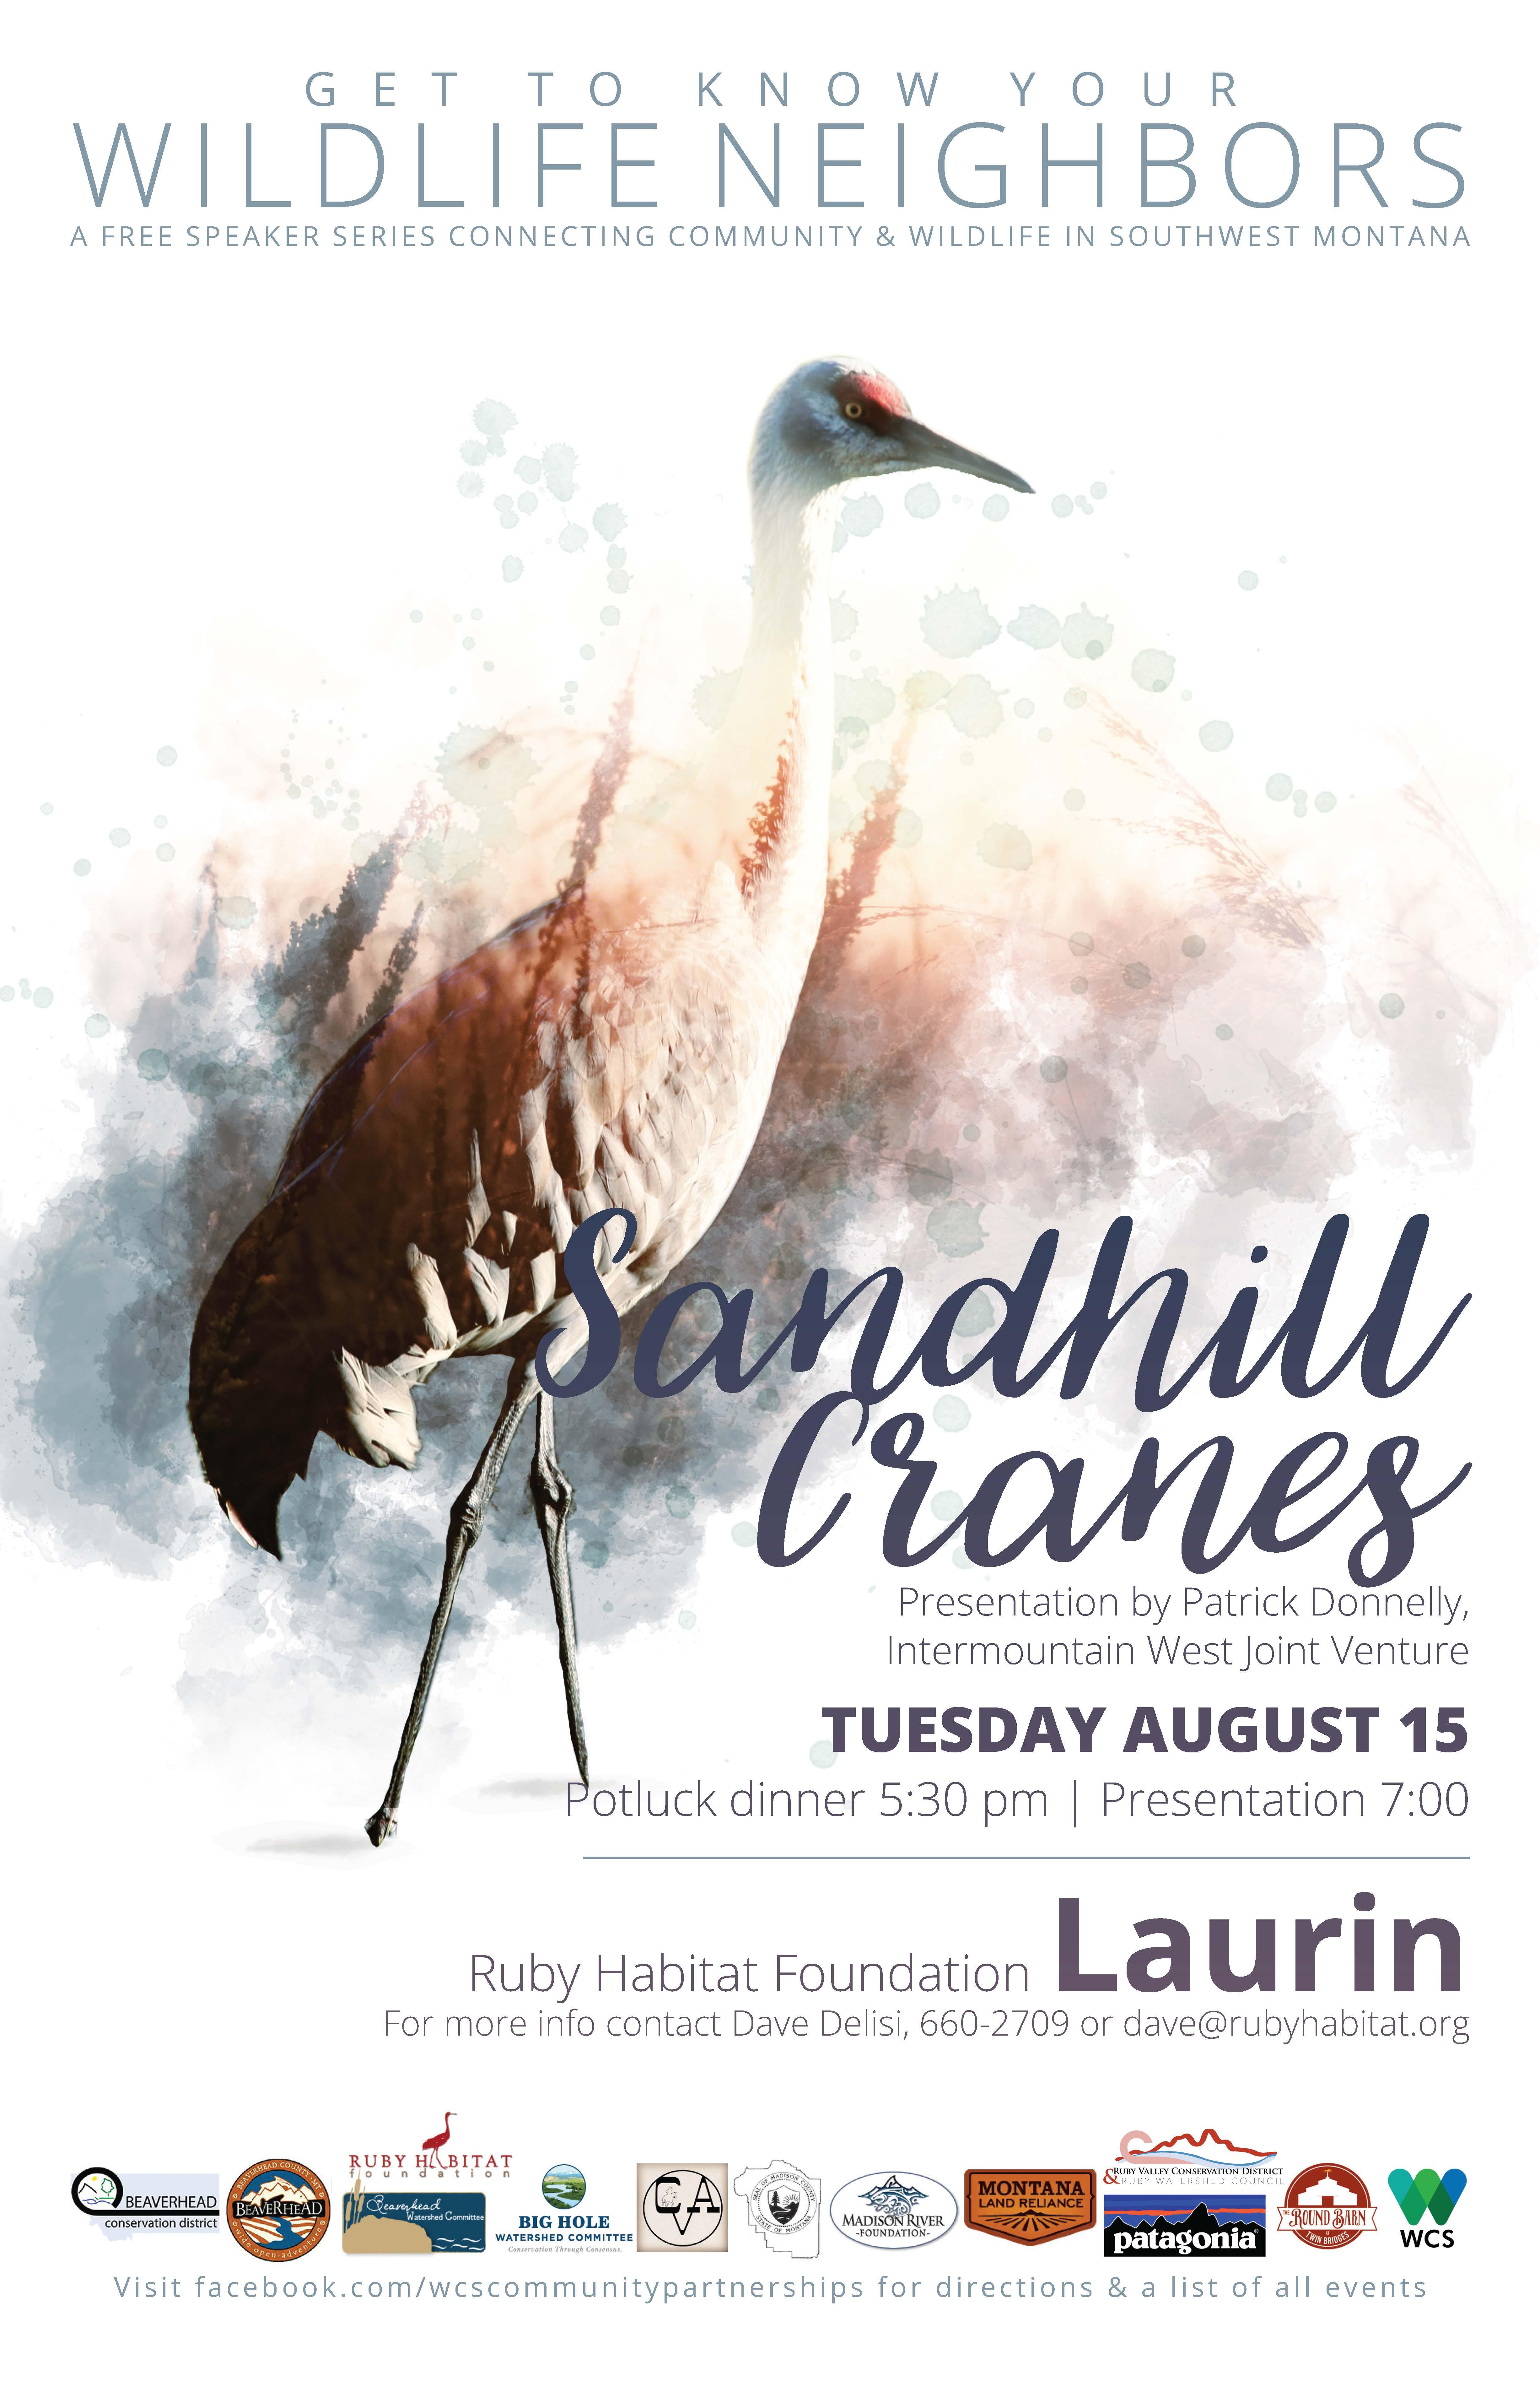 Wildlife Speaker Series Event - Sandhill Cranes @ Ruby Habitat Foundation